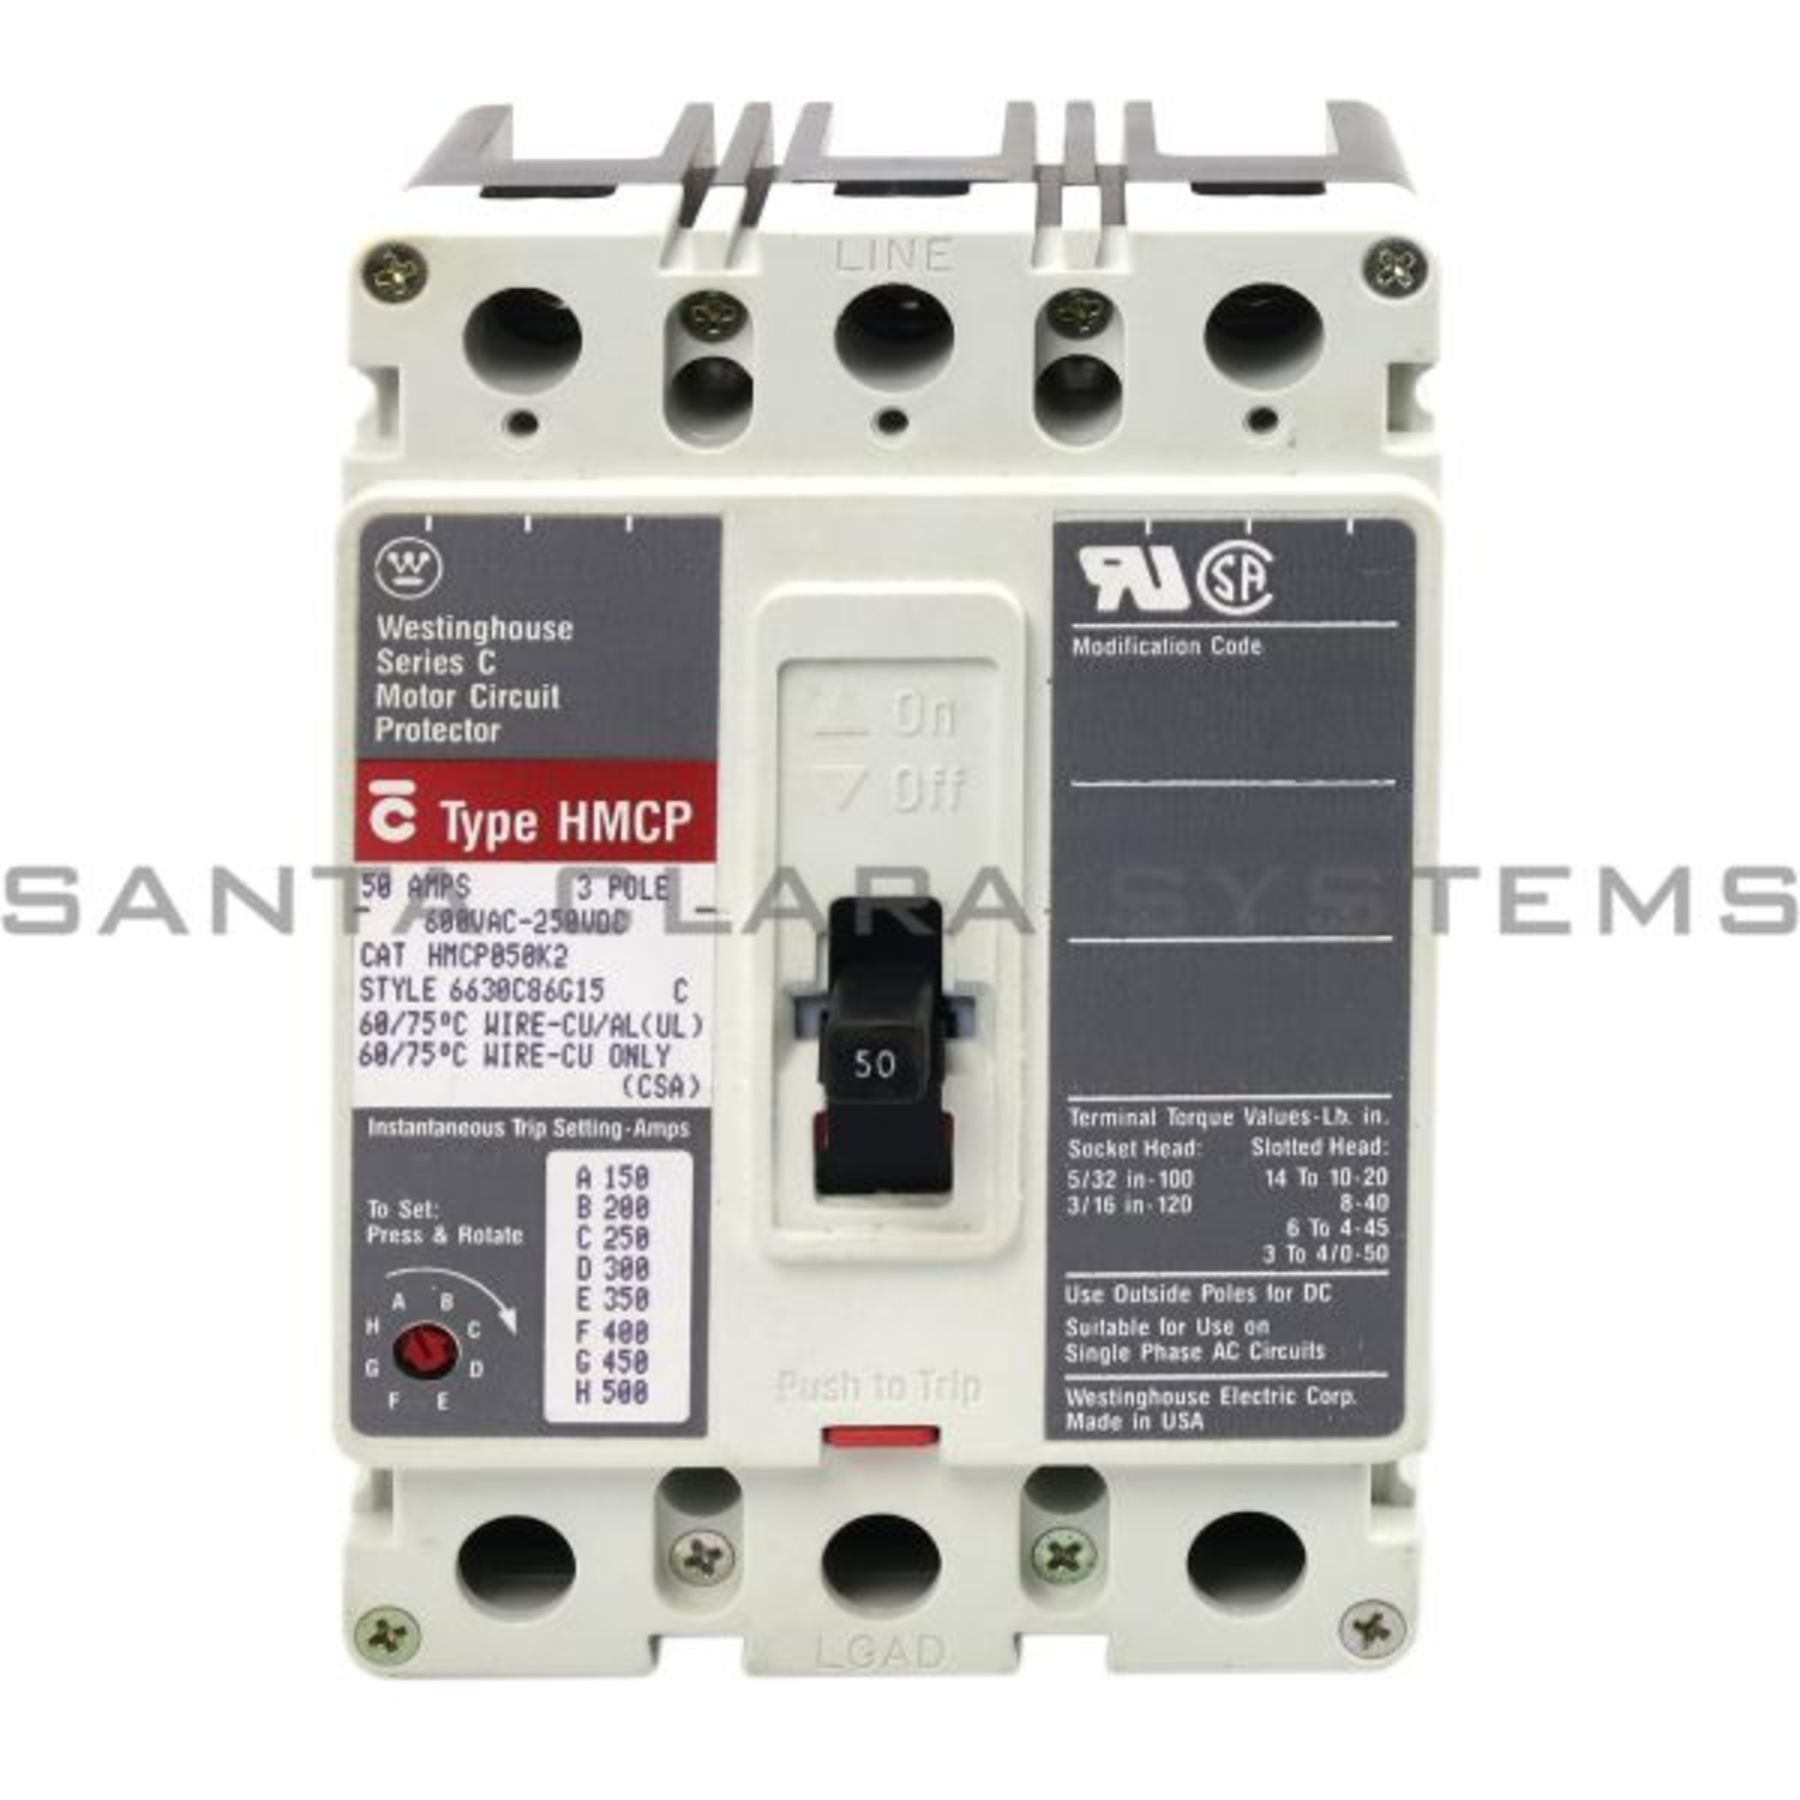 HMCP050K2 Circuit Breaker   50-AMPS   Eaton Cutler-Hammer ... on wiring 30 amp breaker, wiring main breaker panel, wiring 100 amp breaker, wiring gfci circuit breaker,